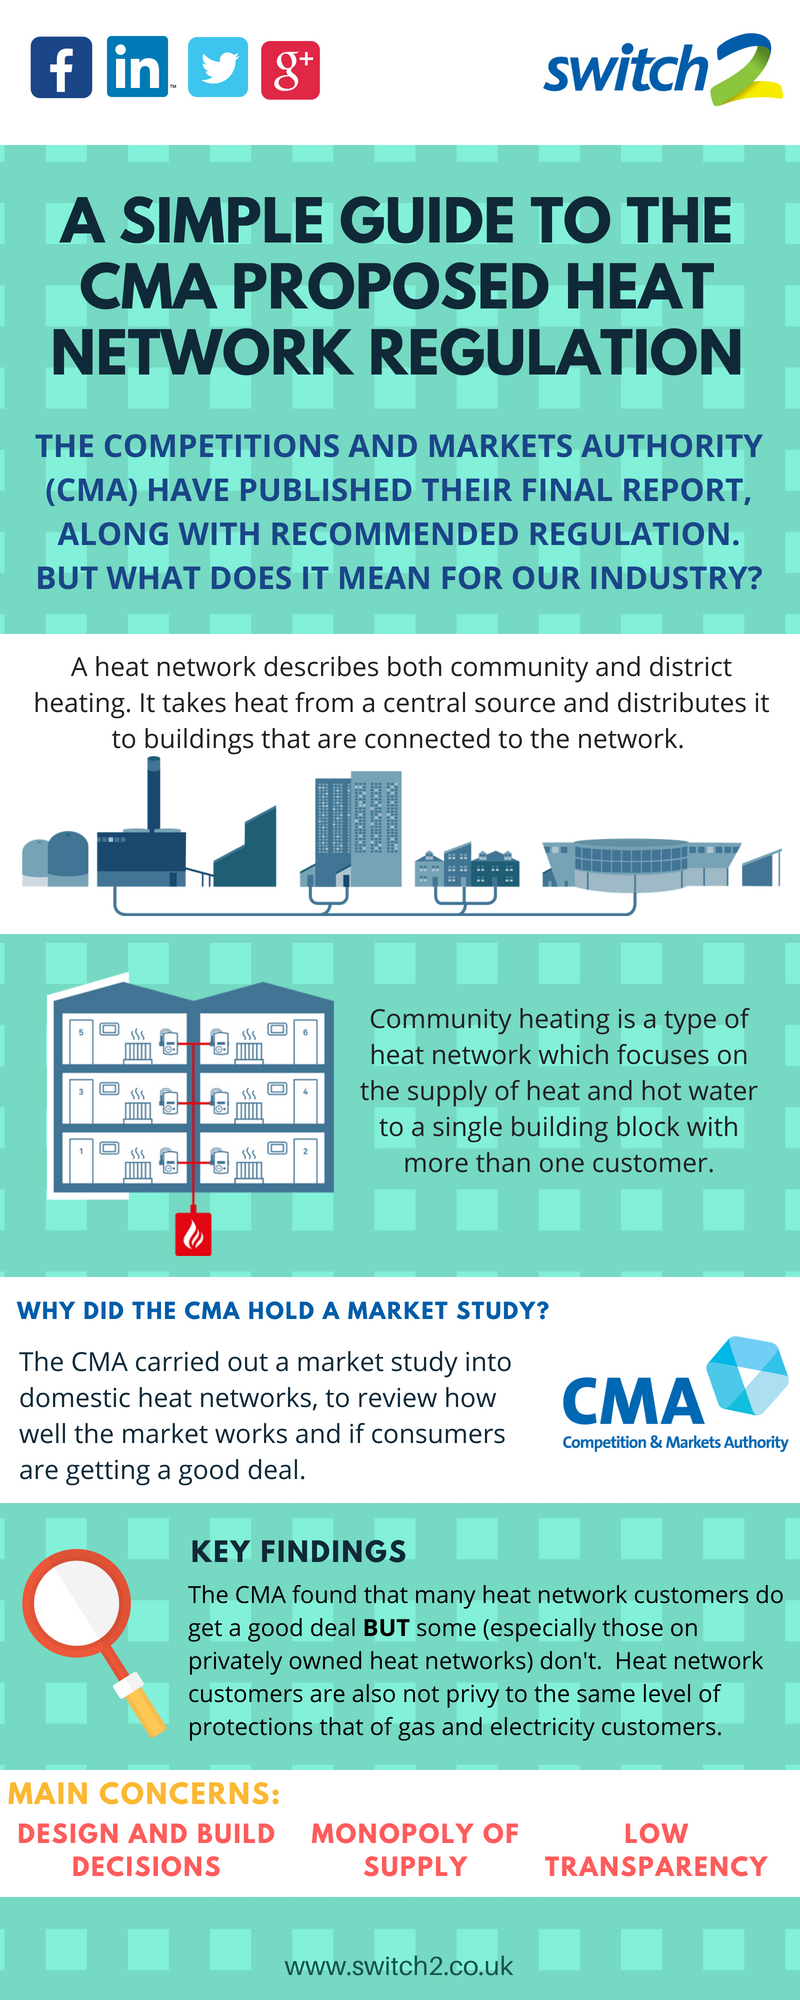 CMA Regulation infographic one